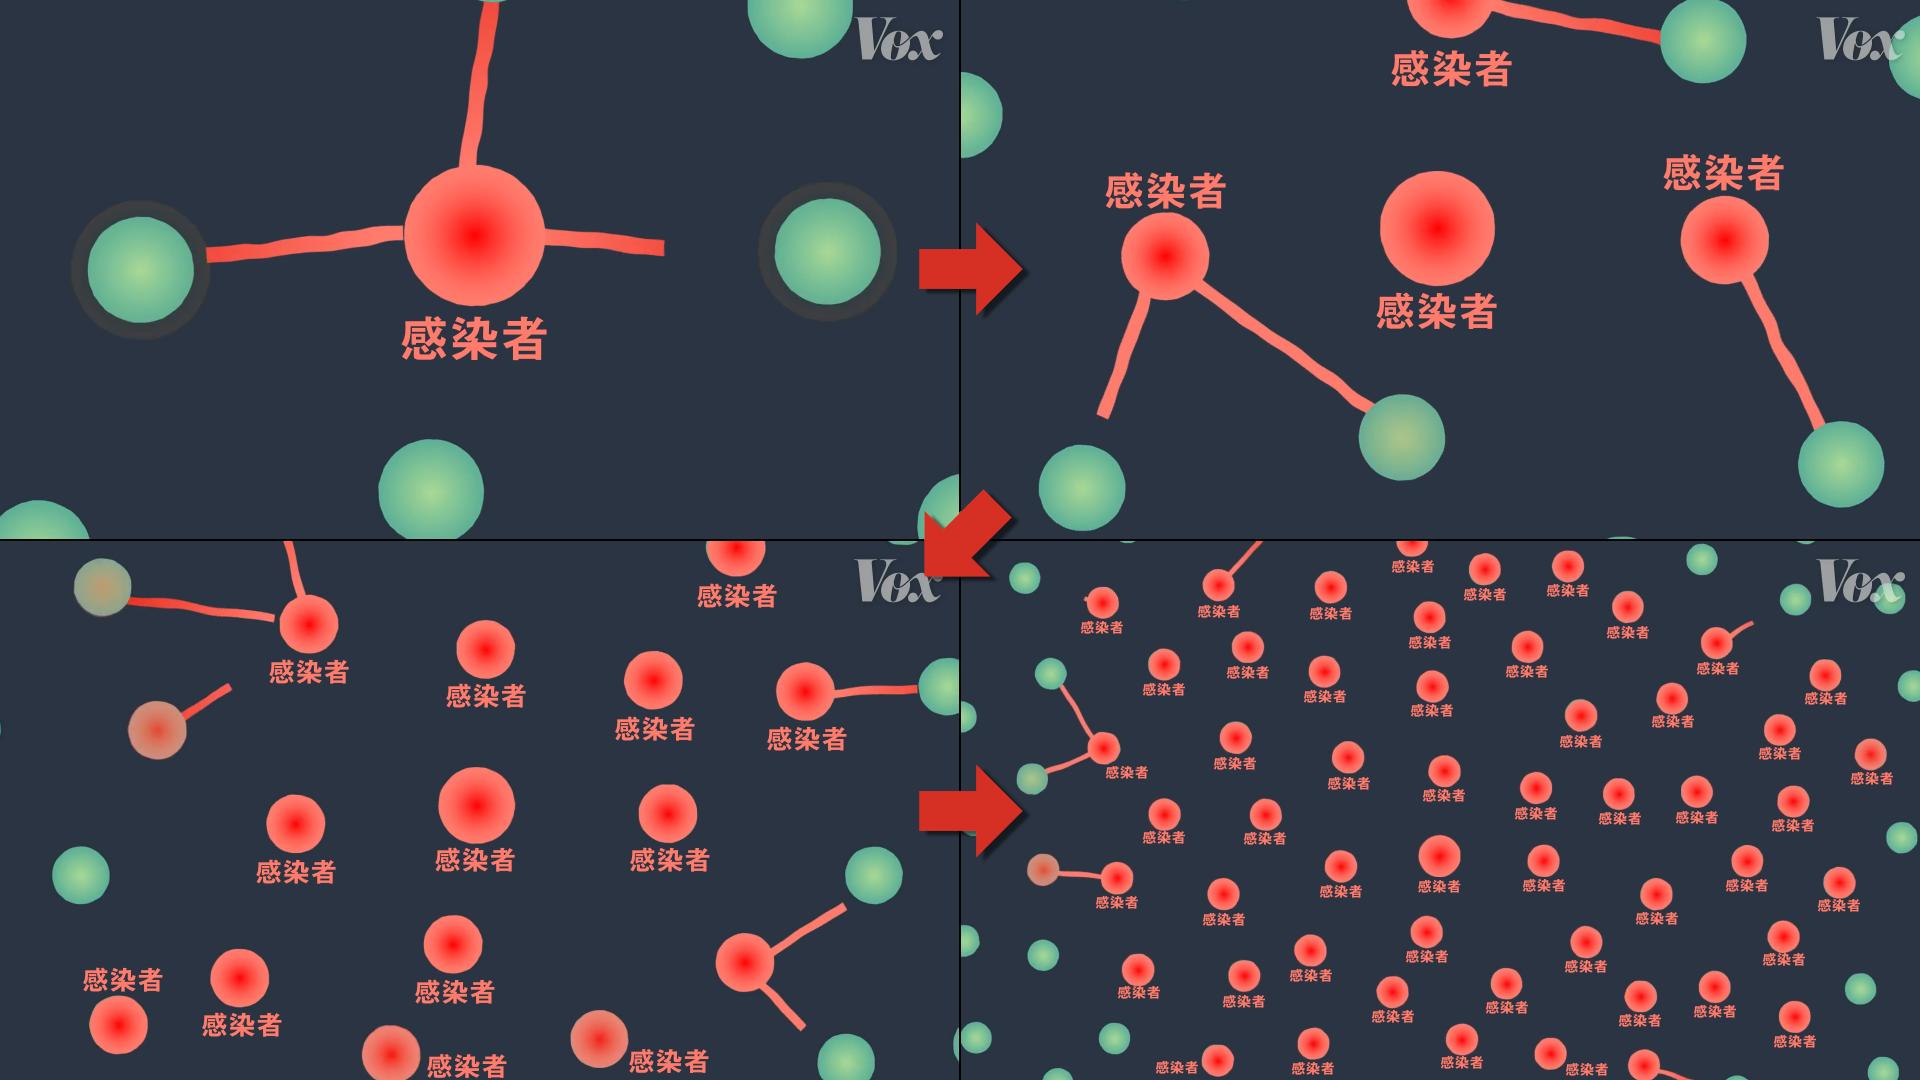 f:id:Imamura:20200408171053p:plain